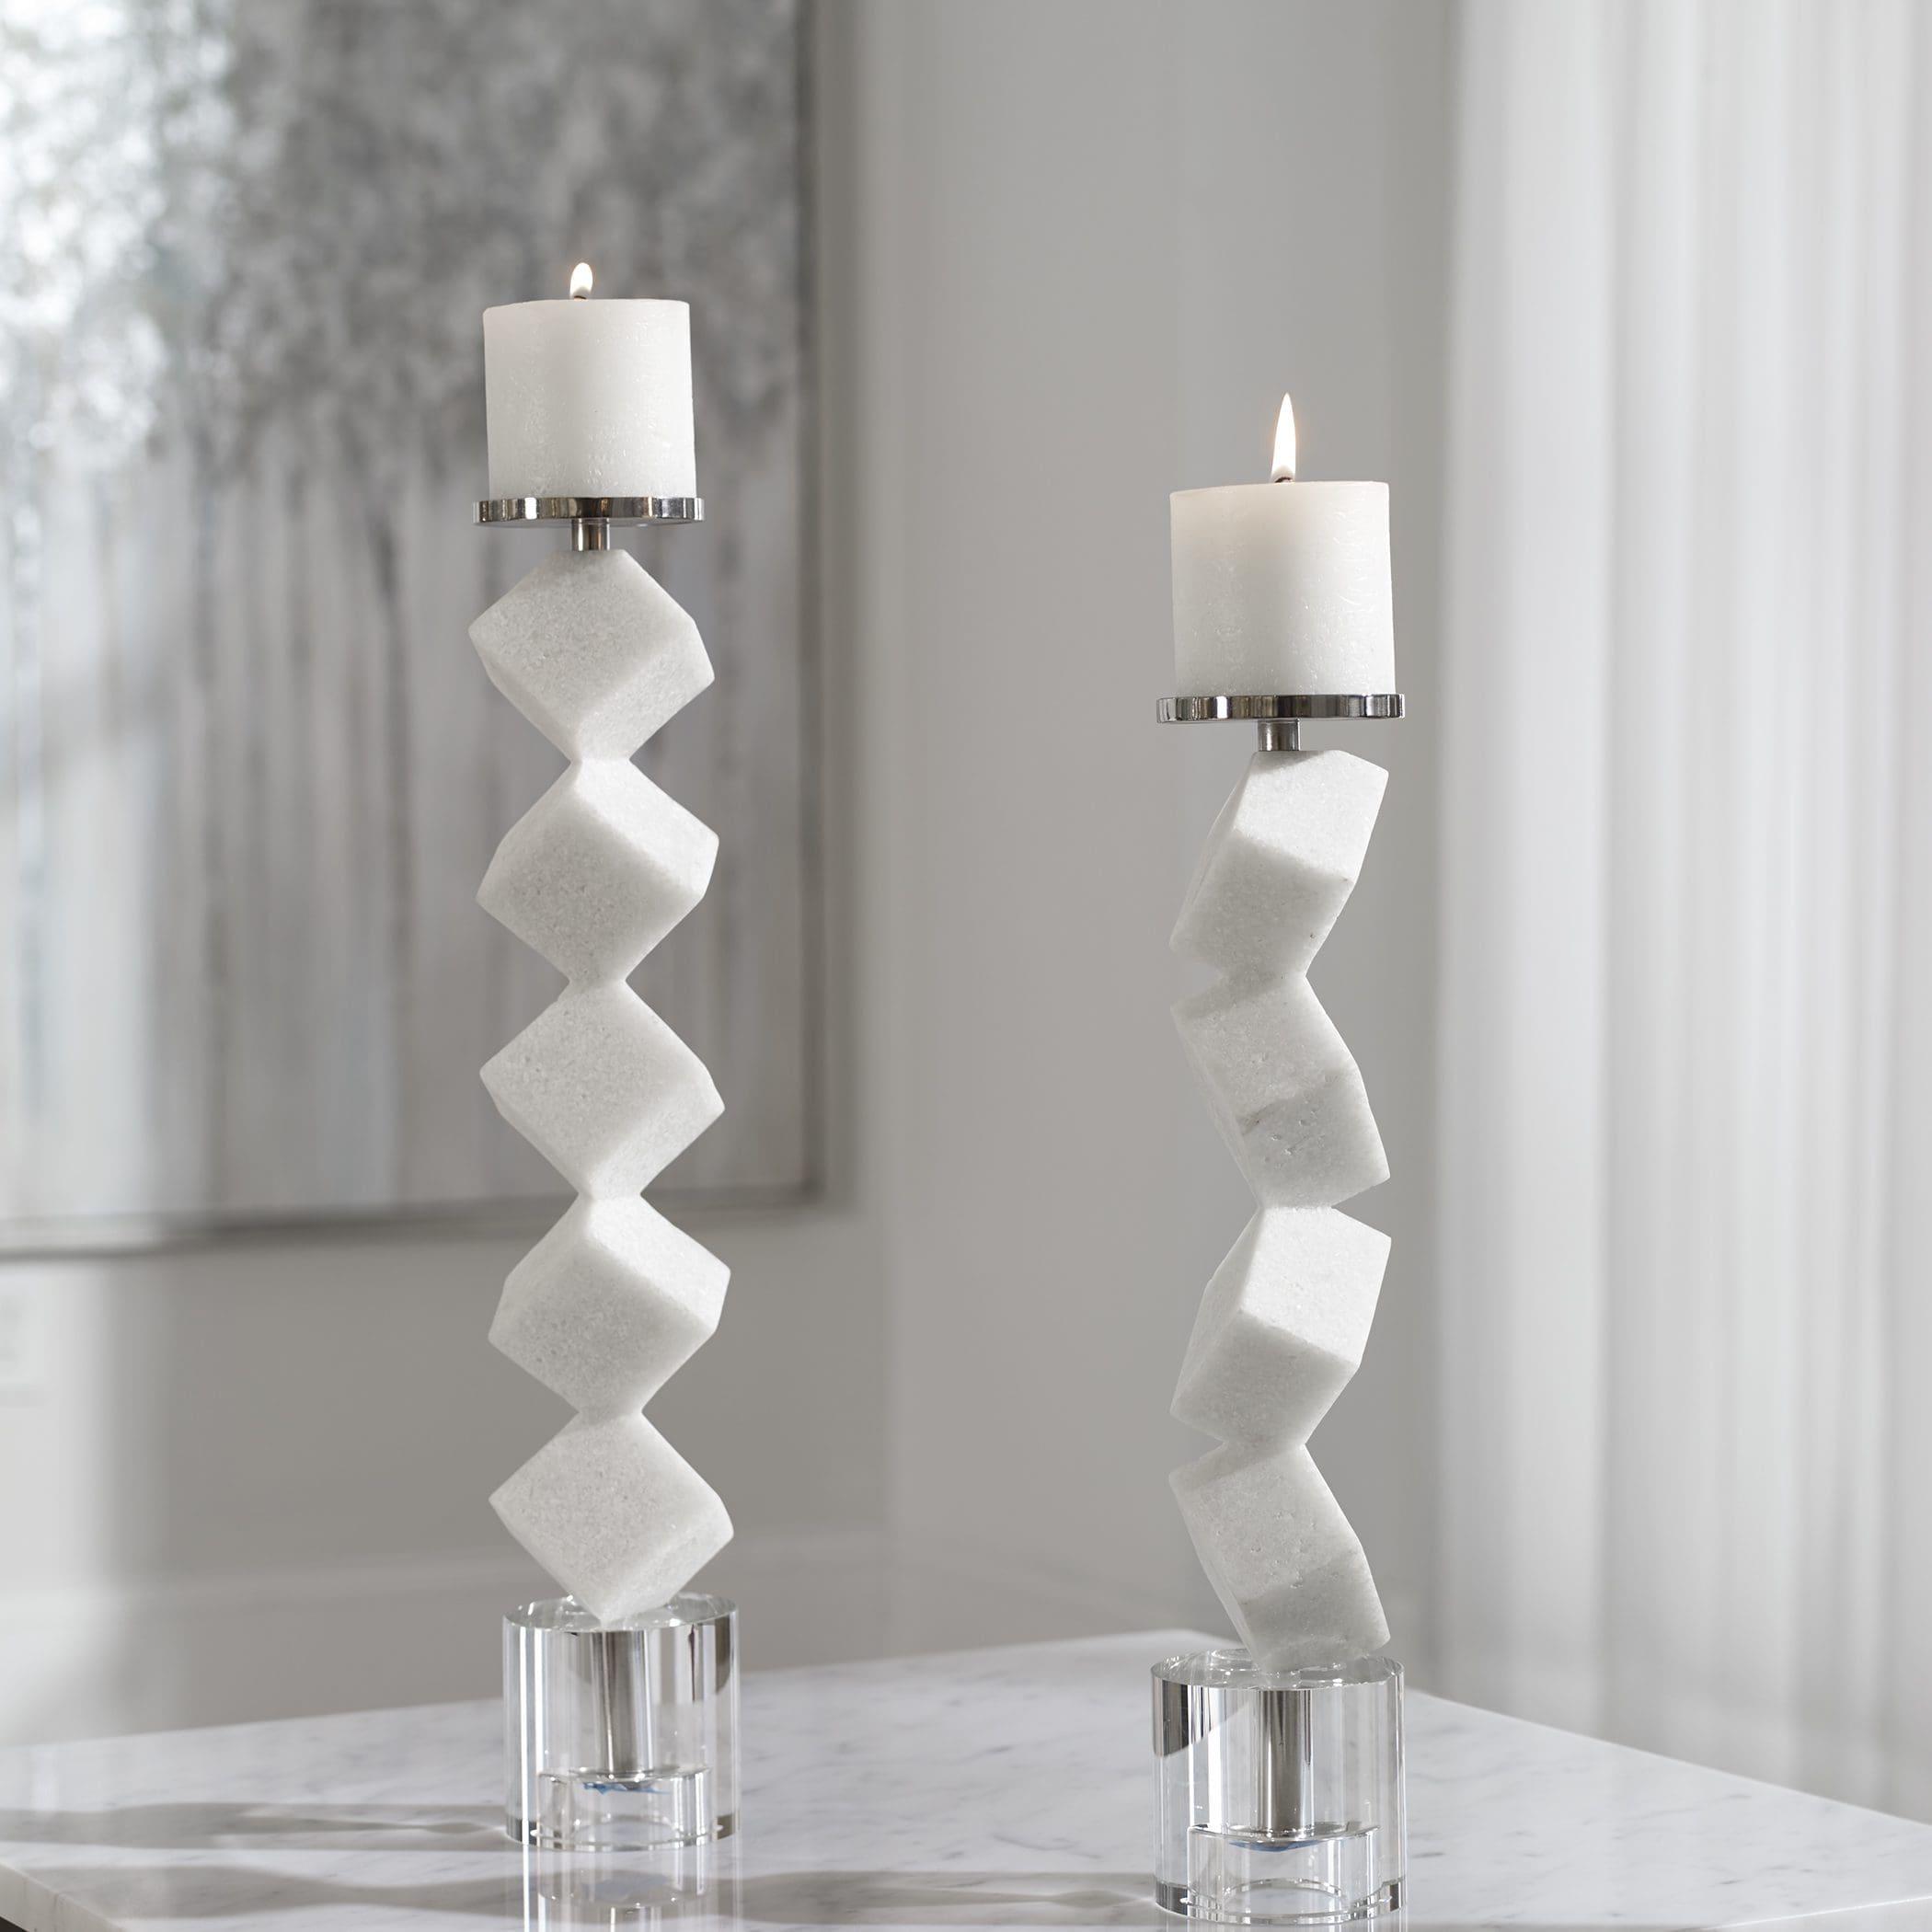 Uttermost Casen Marble Cube Candleholders, S/2